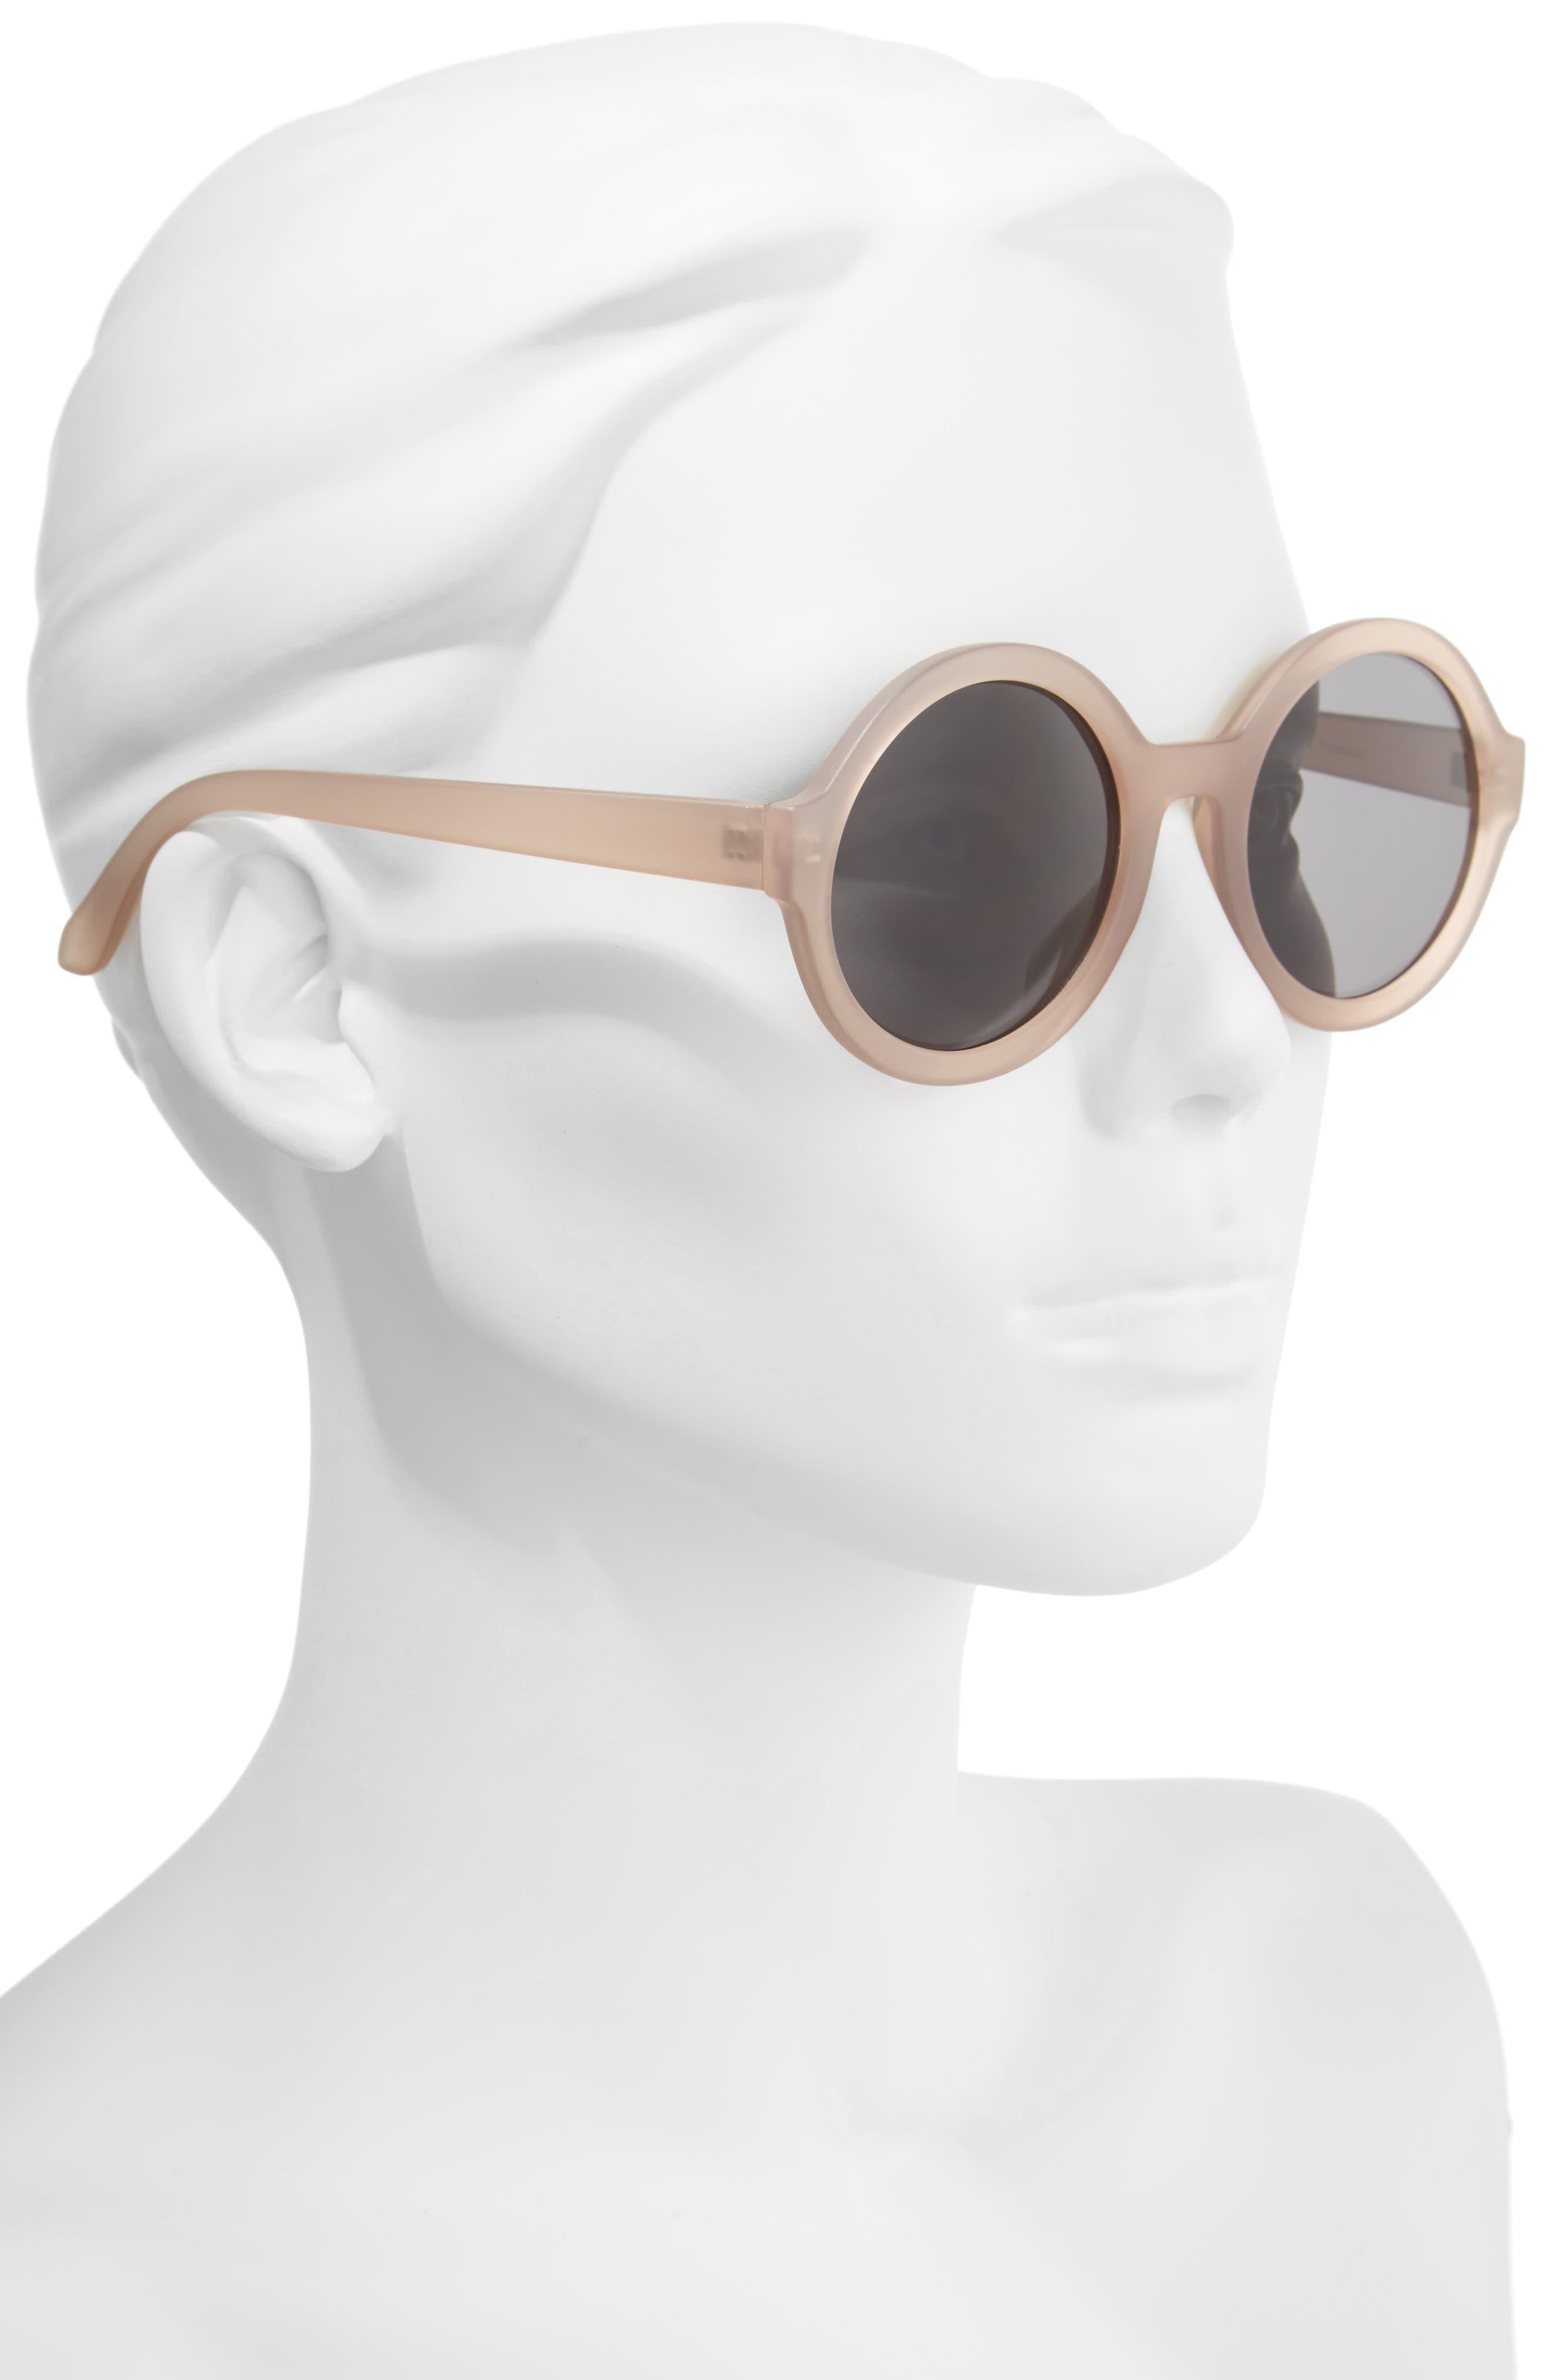 50mm Round Sunglasses,                             Alternate thumbnail 2, color,                             650